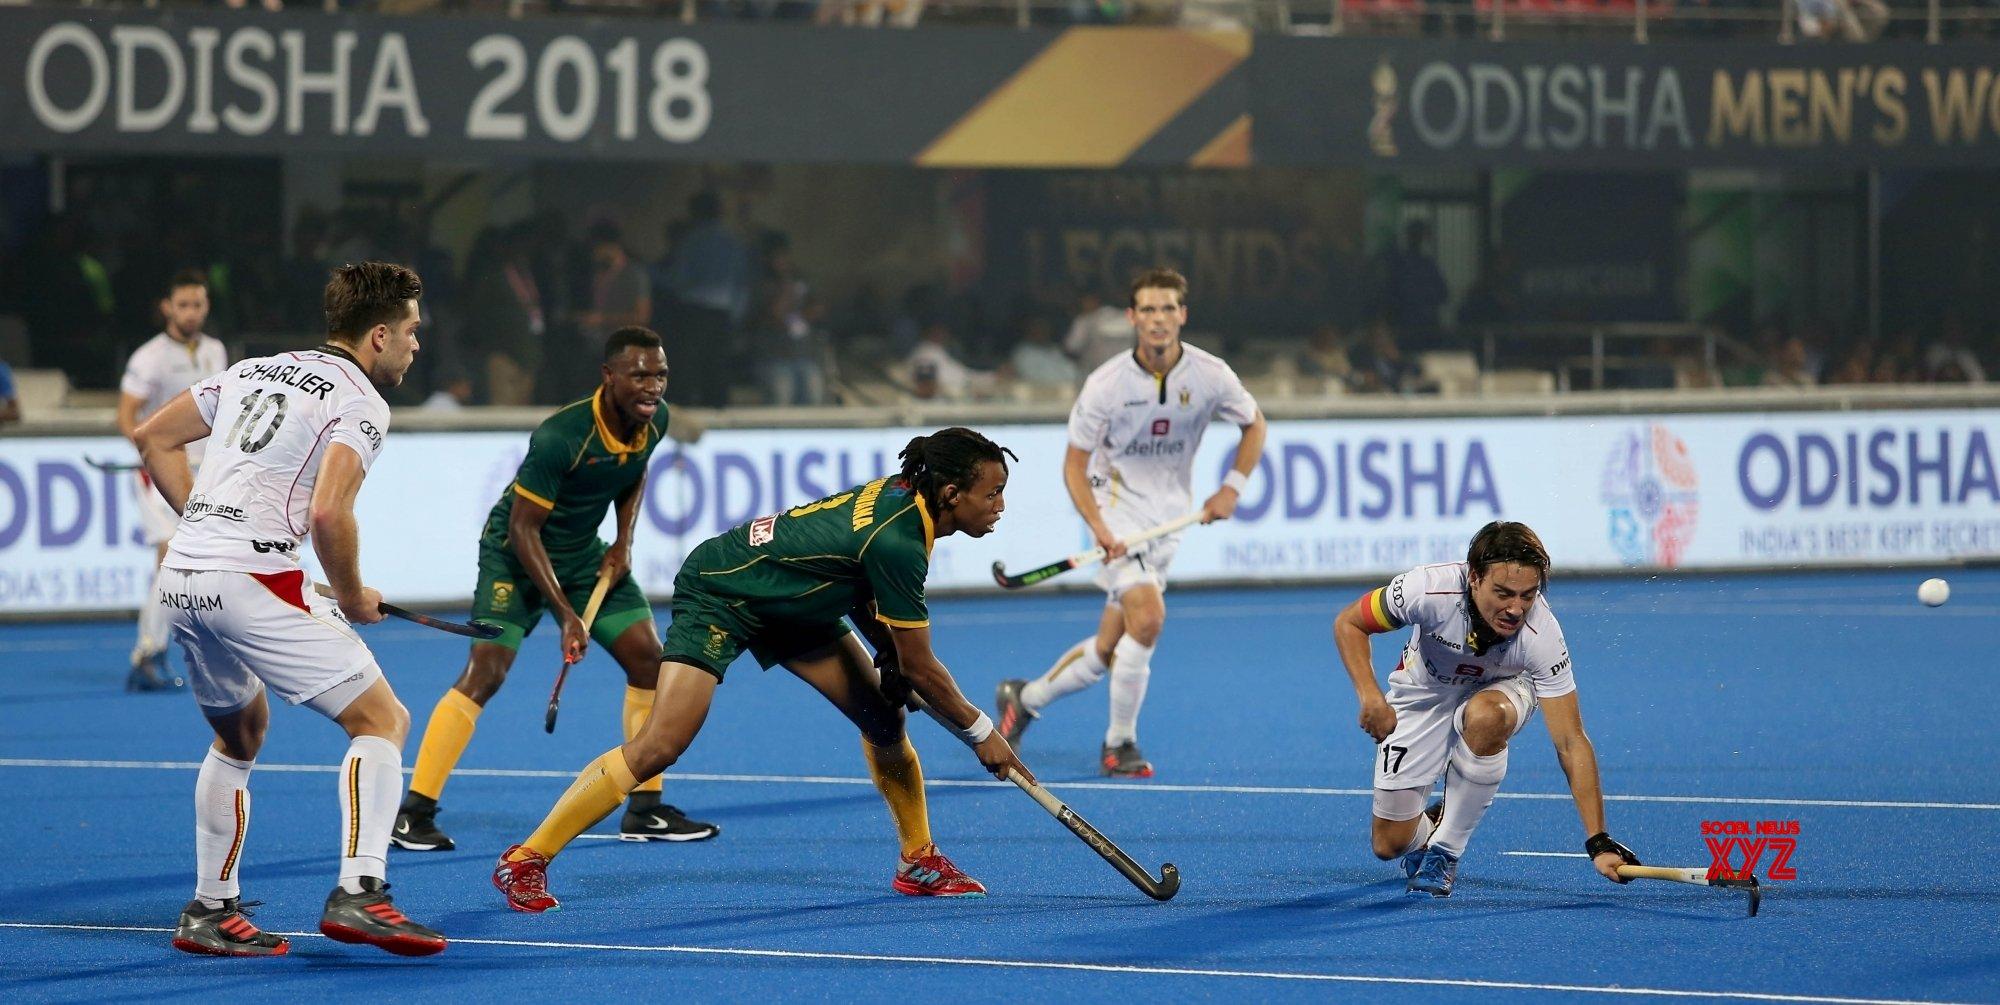 Hockey: Belgium thrash South Africa in last pool match